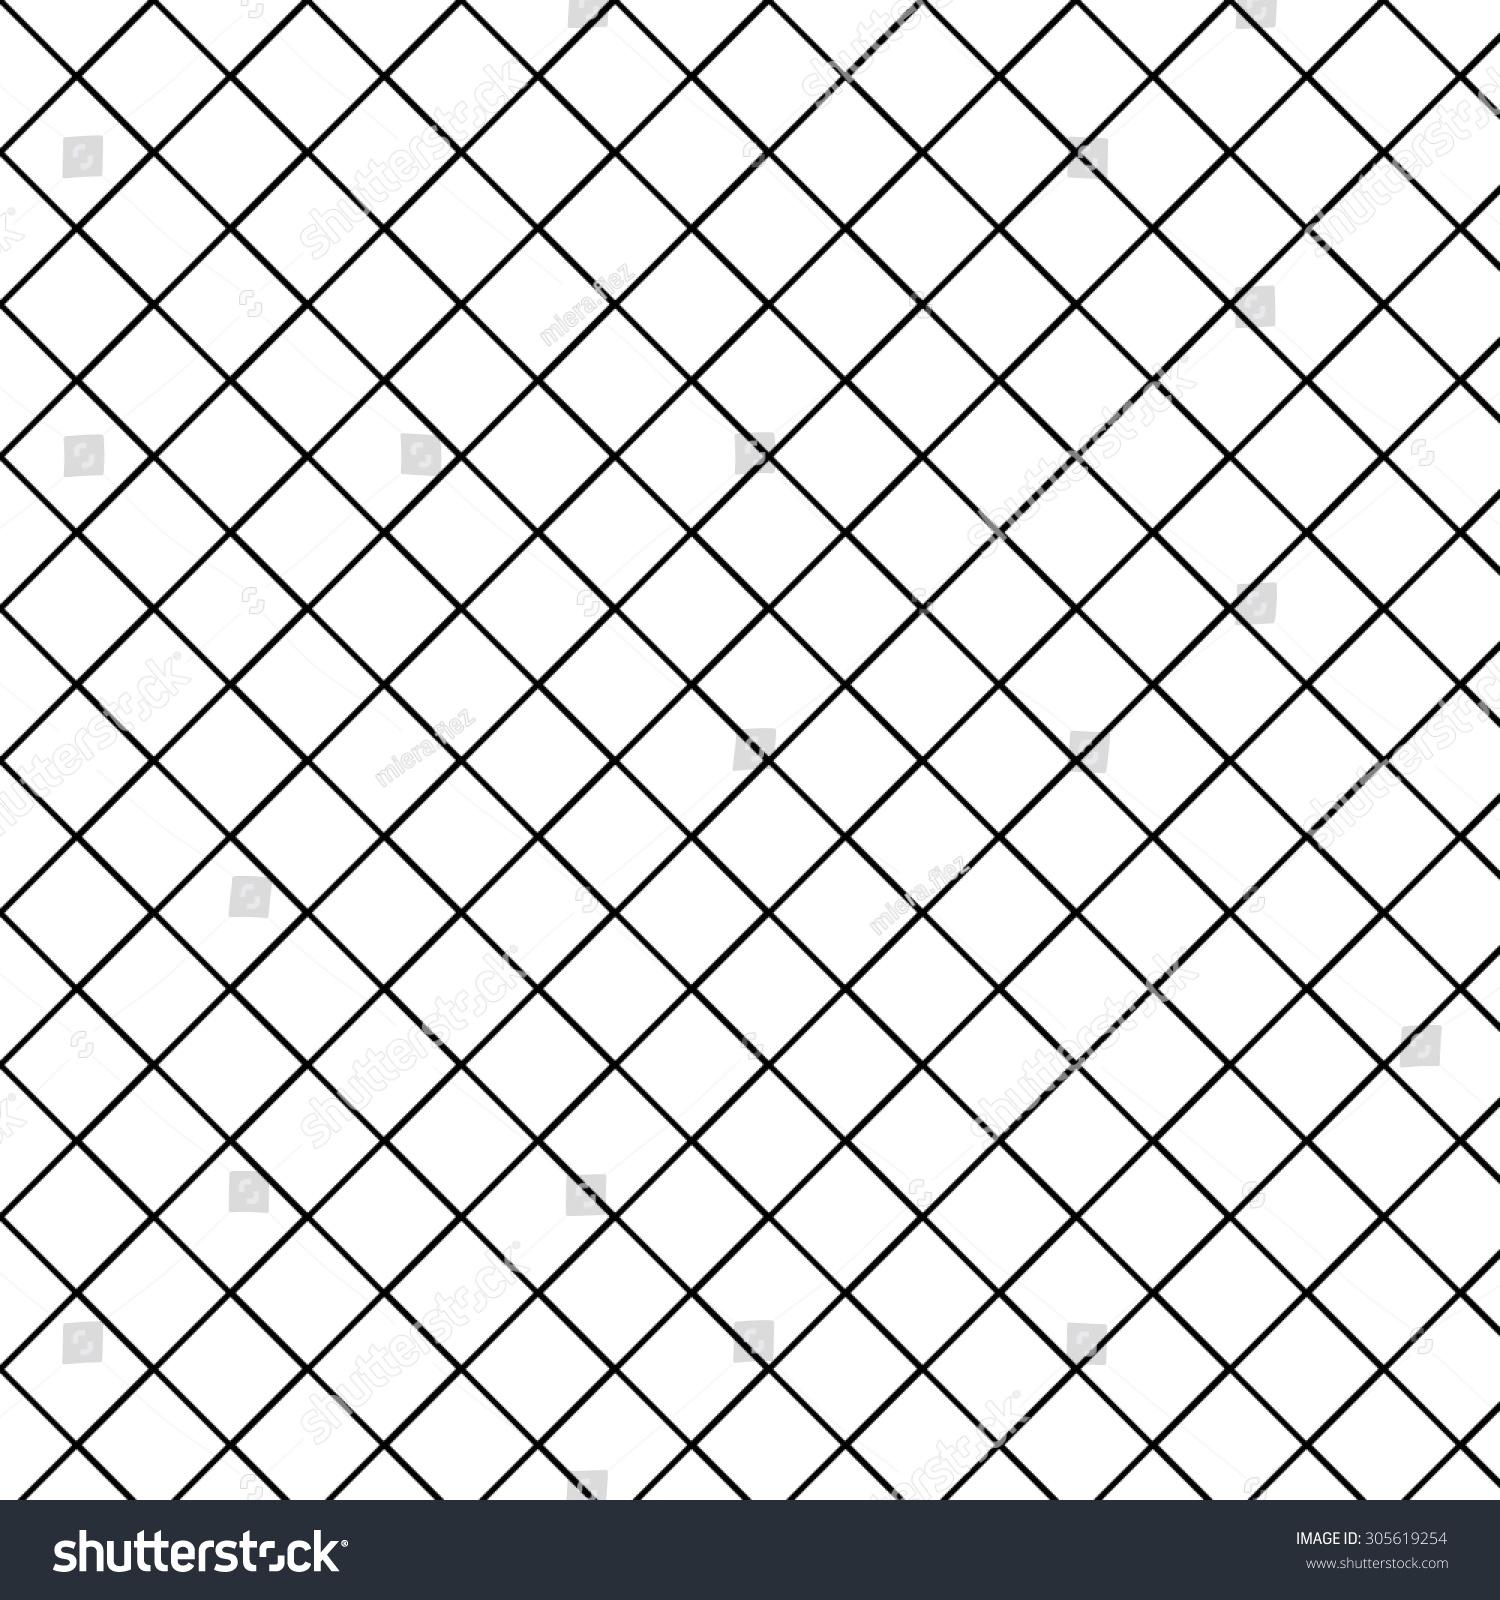 diamond pattern white background black line stock